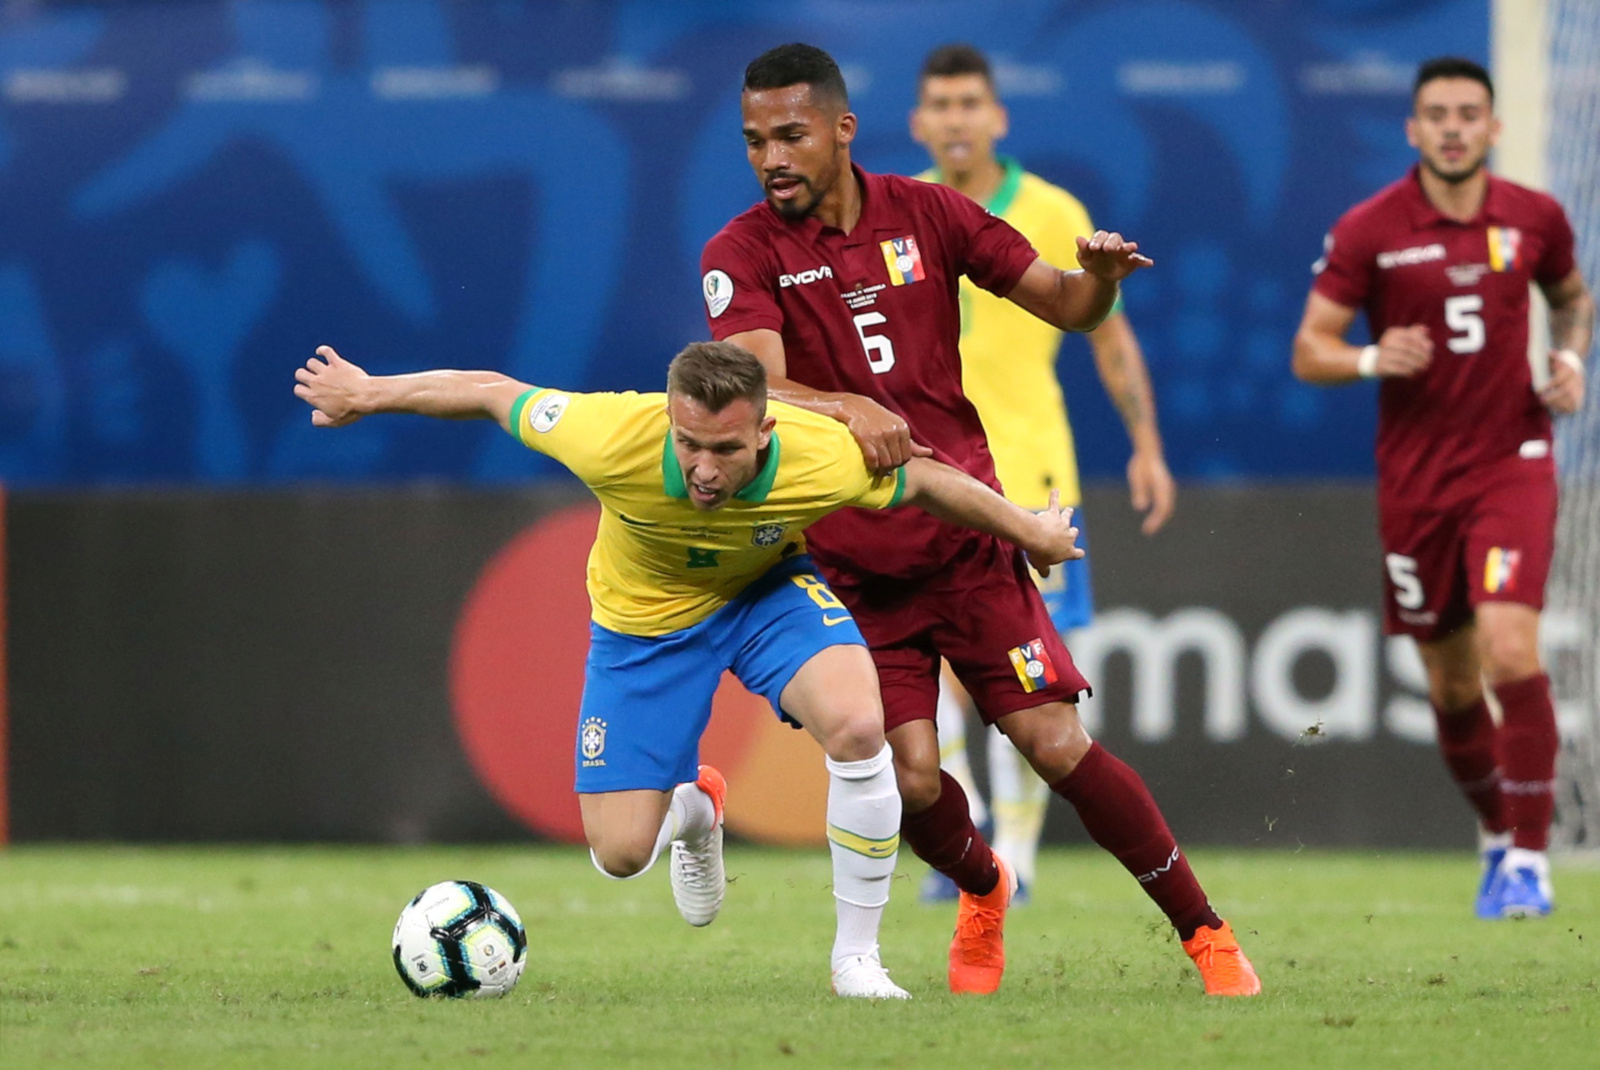 [watch@Soccer 2021-]Brasil vs Venezuela Transmisión en vivo 2021 canales gratuitos de reddit / twitter – Film Daily